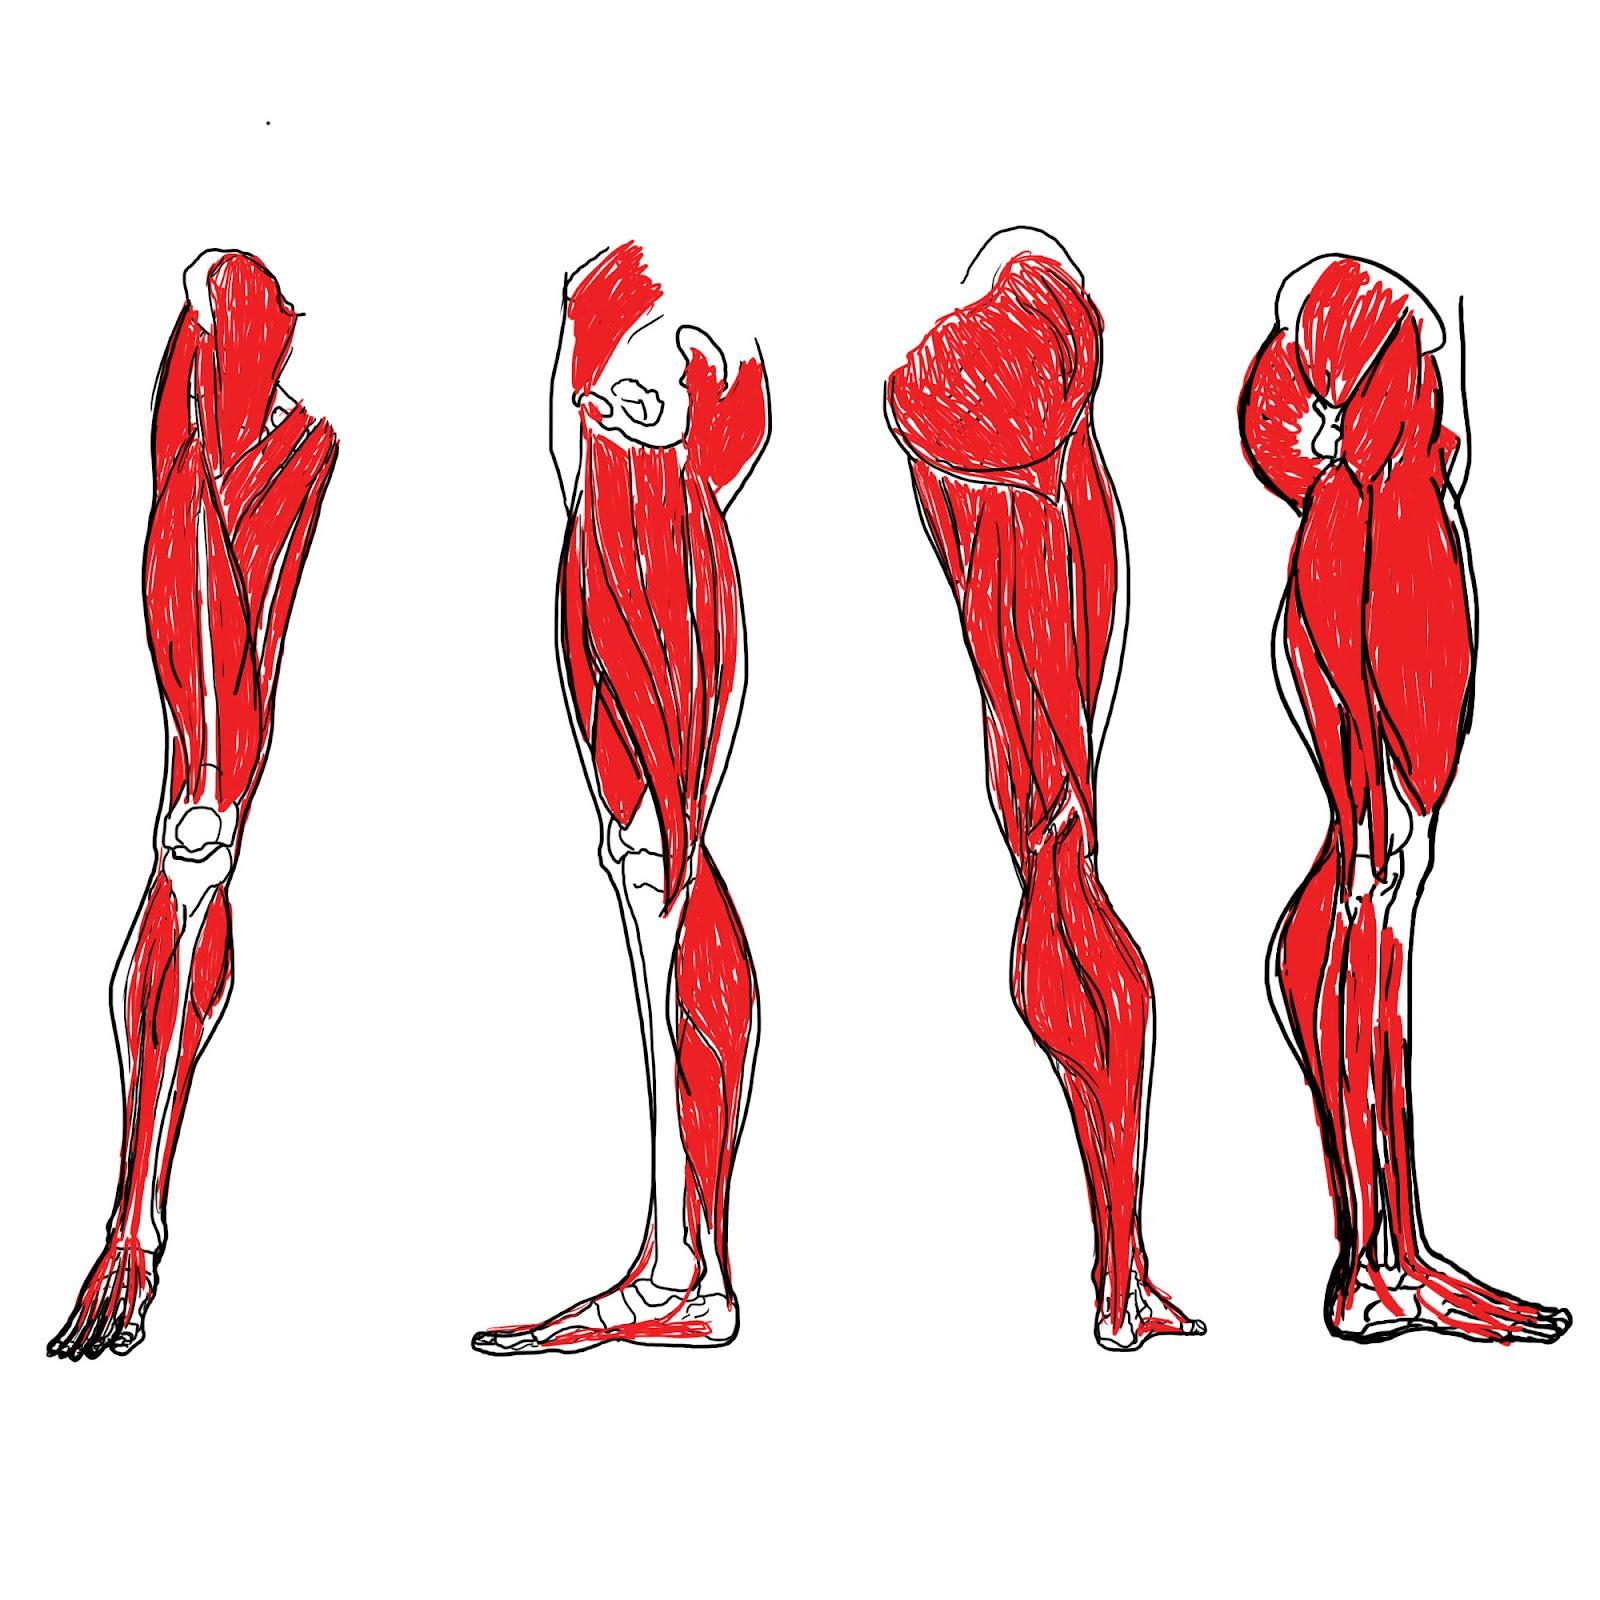 Joe S Art Splosion Blog Legs And Muscles